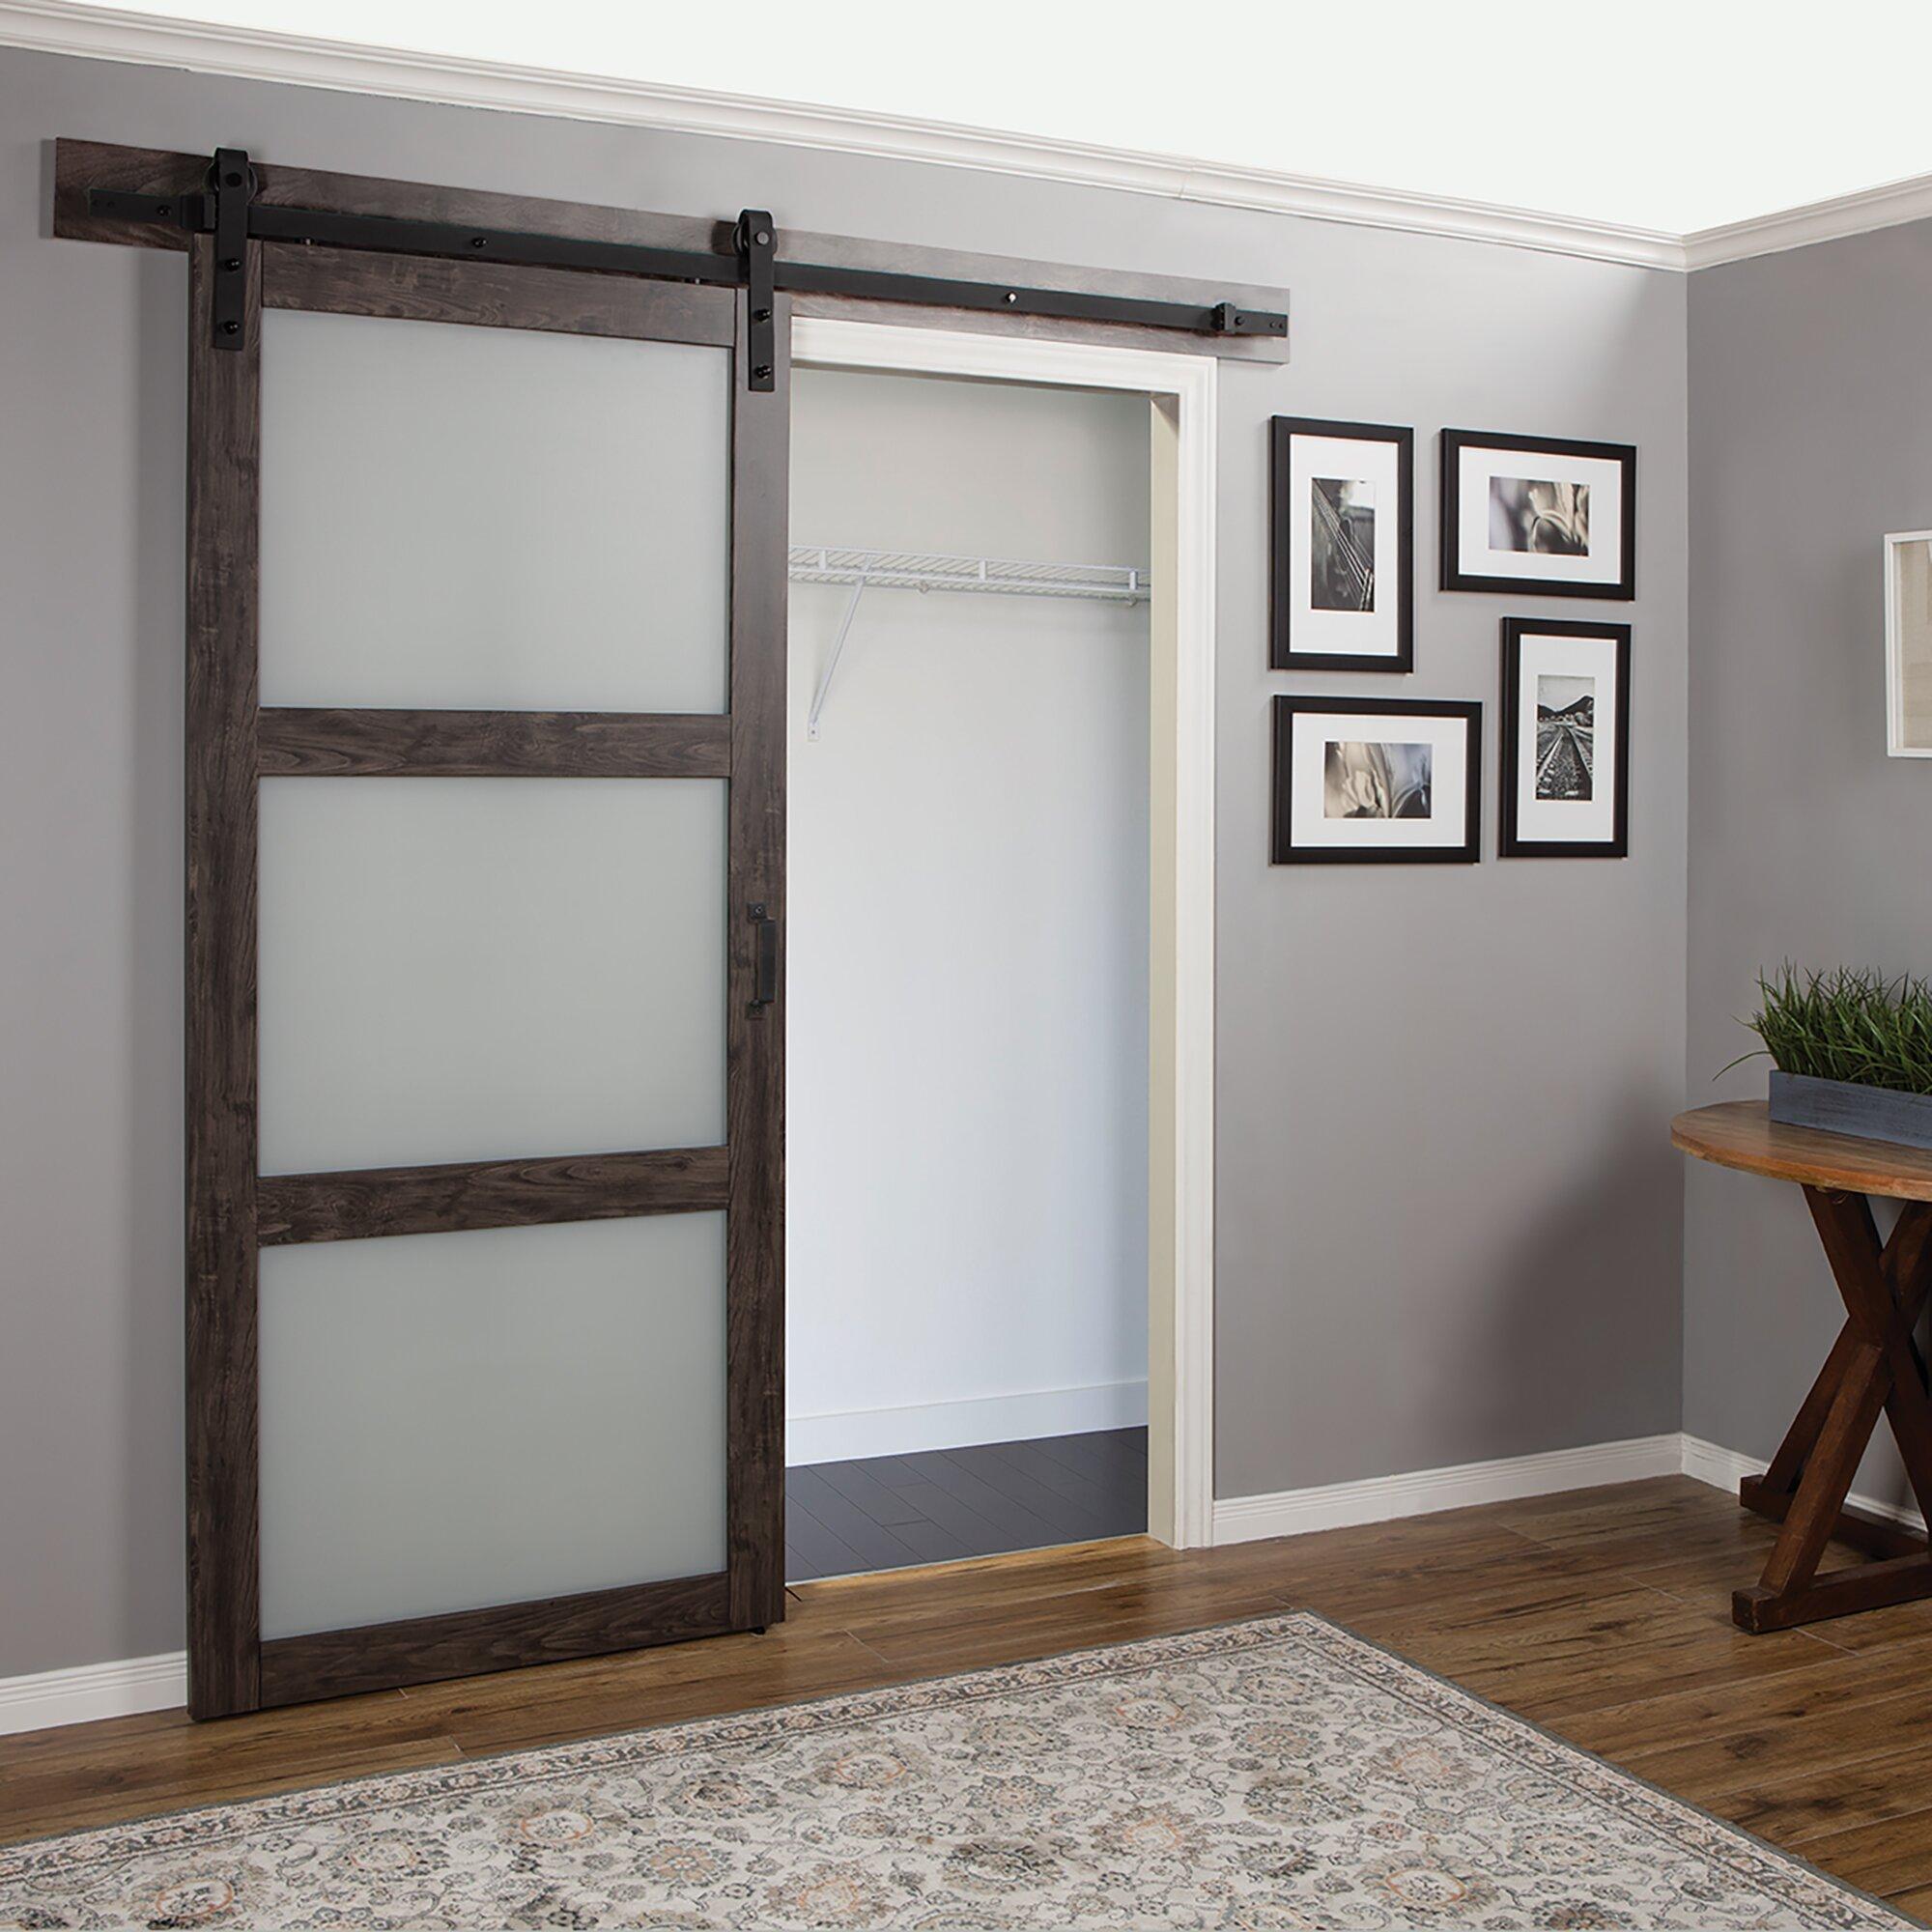 Sliding Glass Wall Doors Interior Sliding Doors Glass Closet Doors Dividers